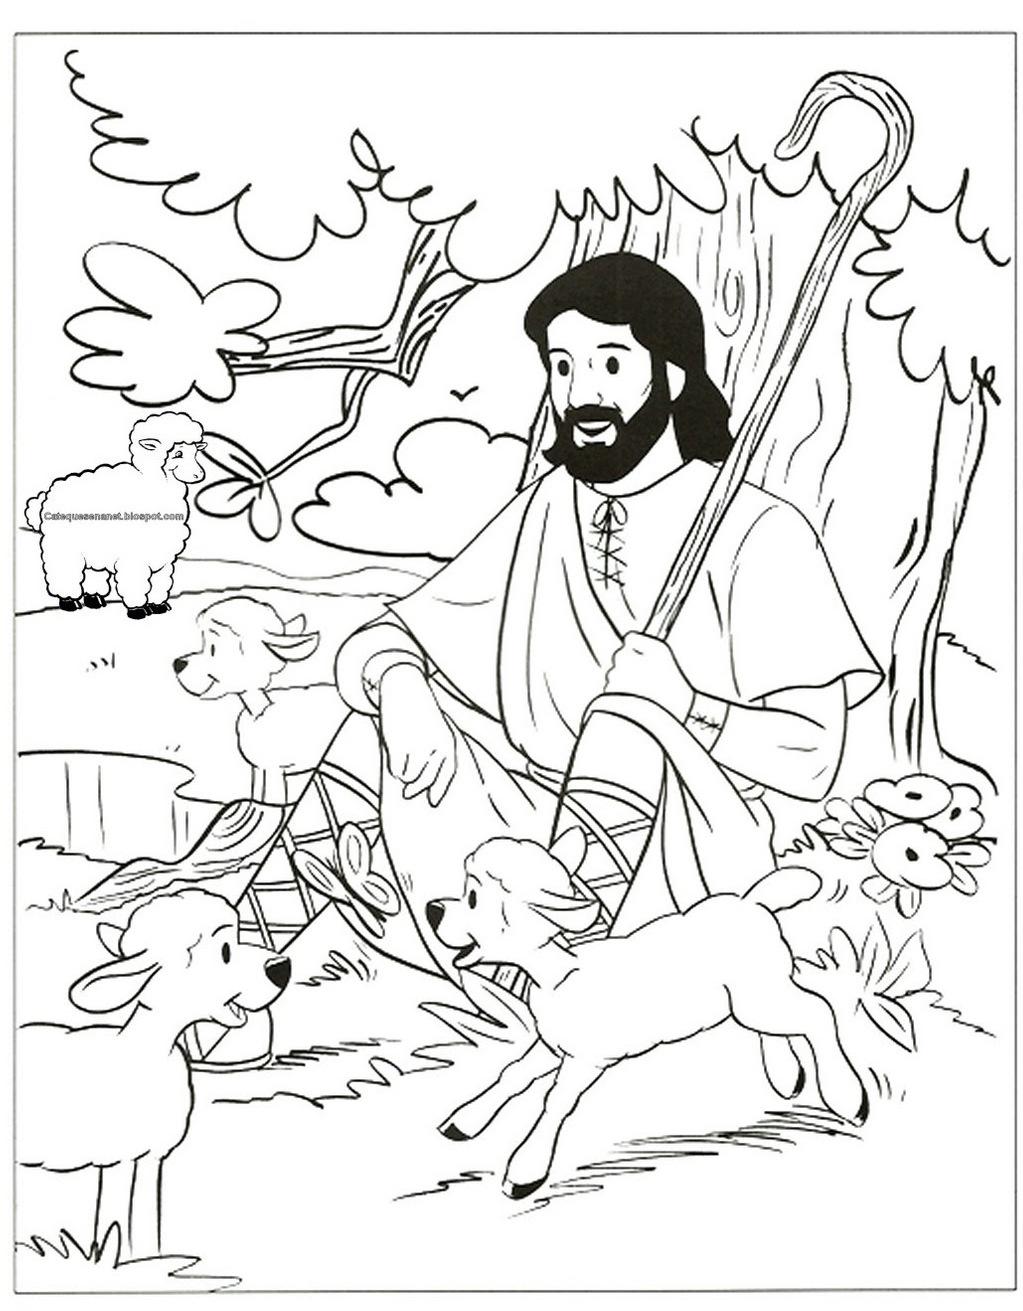 parable of the good shepherd the good shepherd